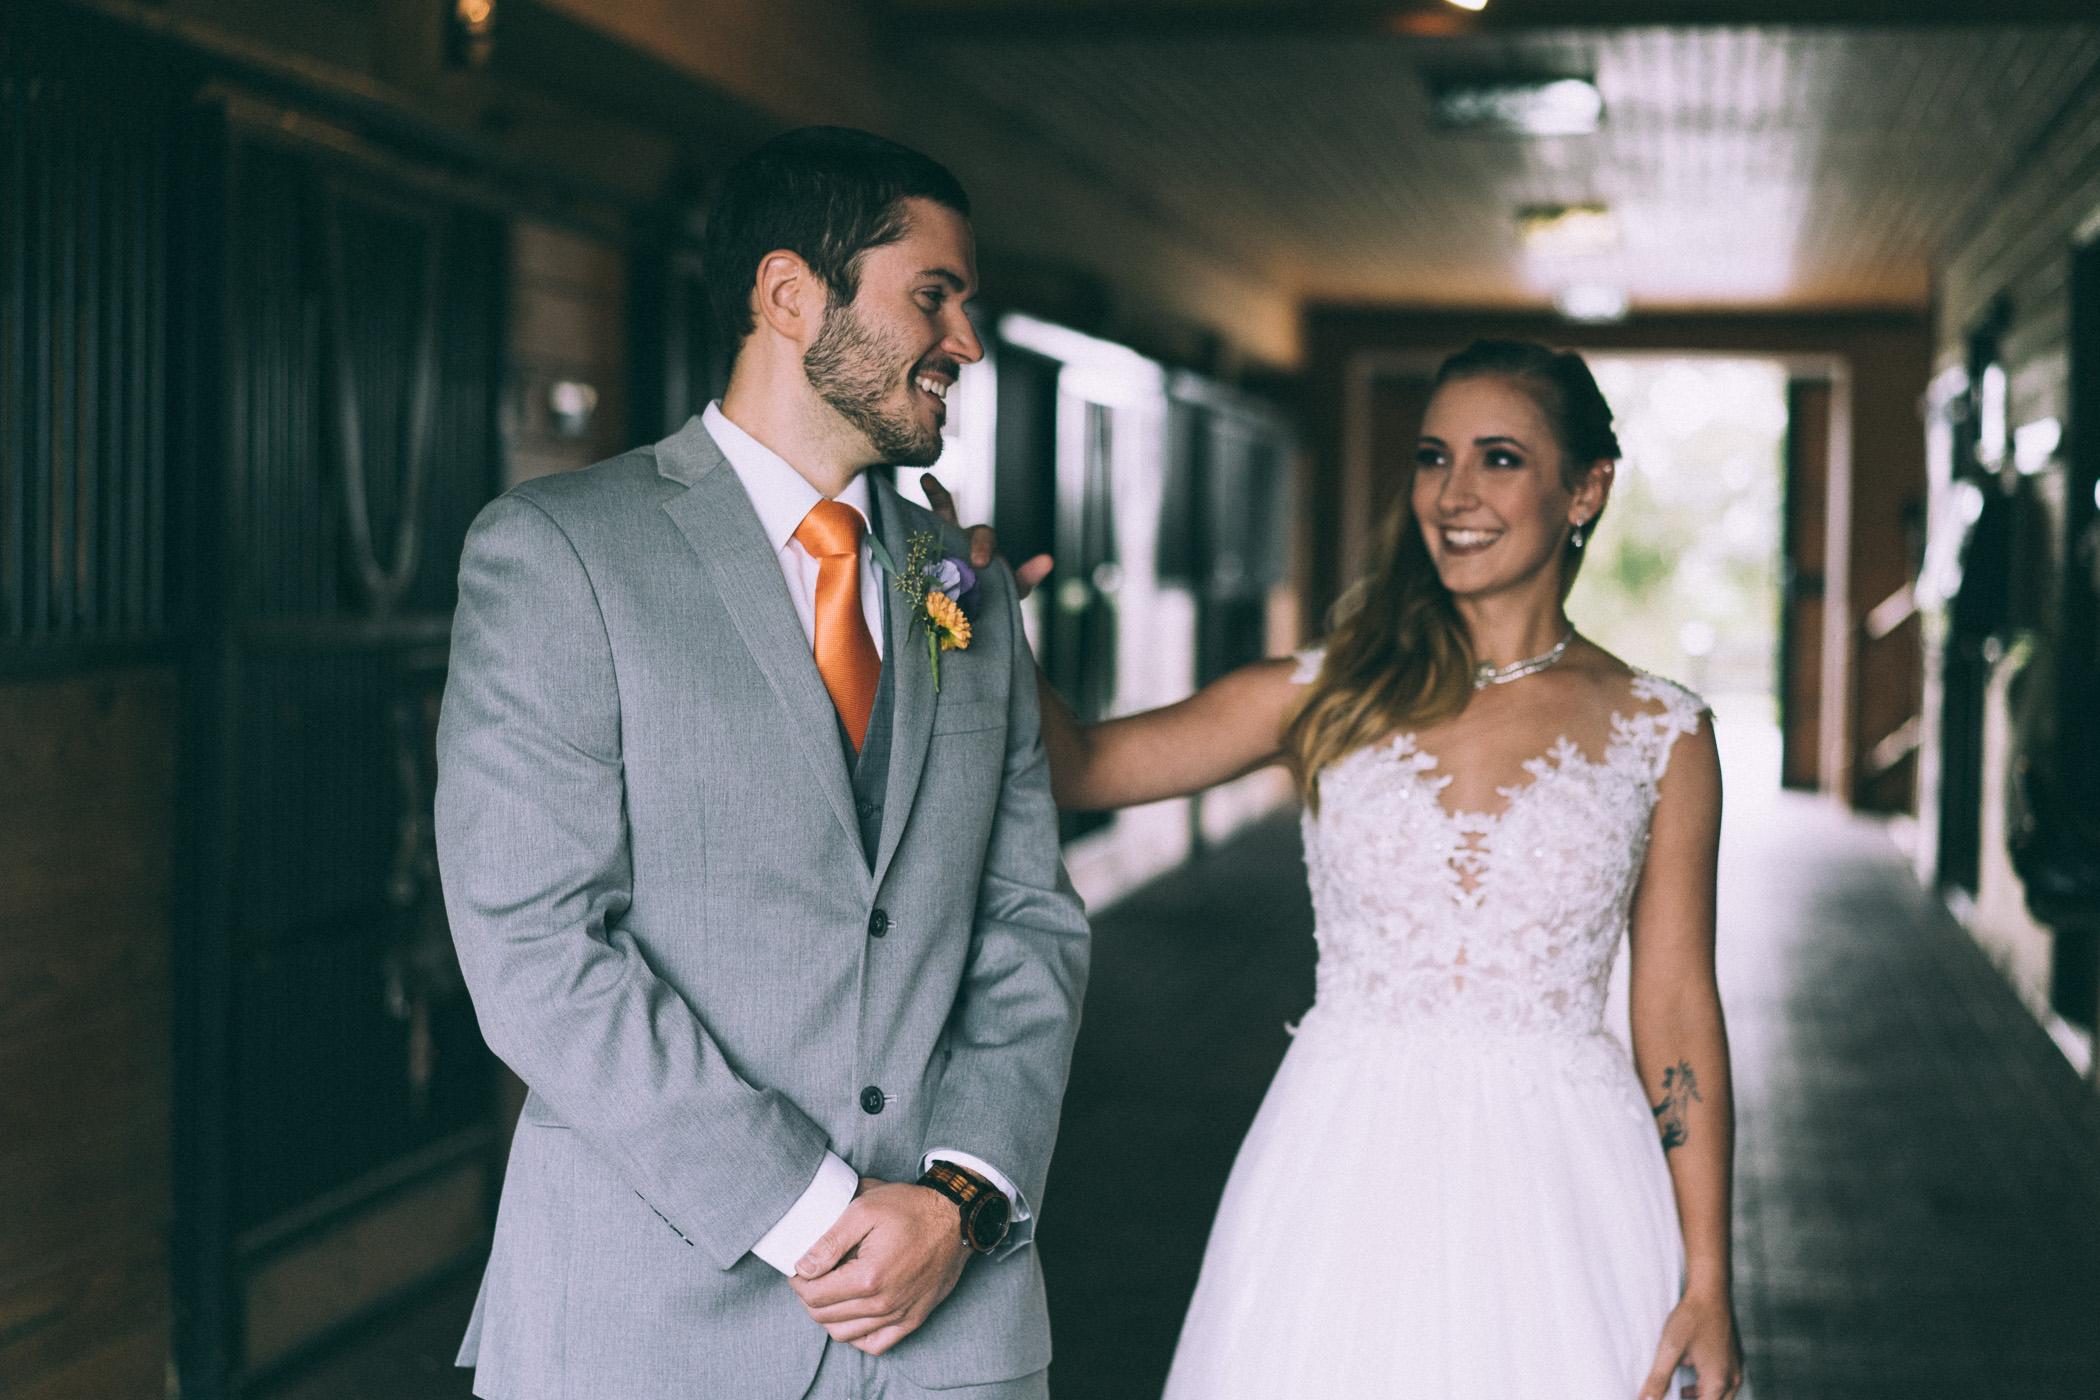 18-Faux Wedding-brandon shane warren-145.jpg